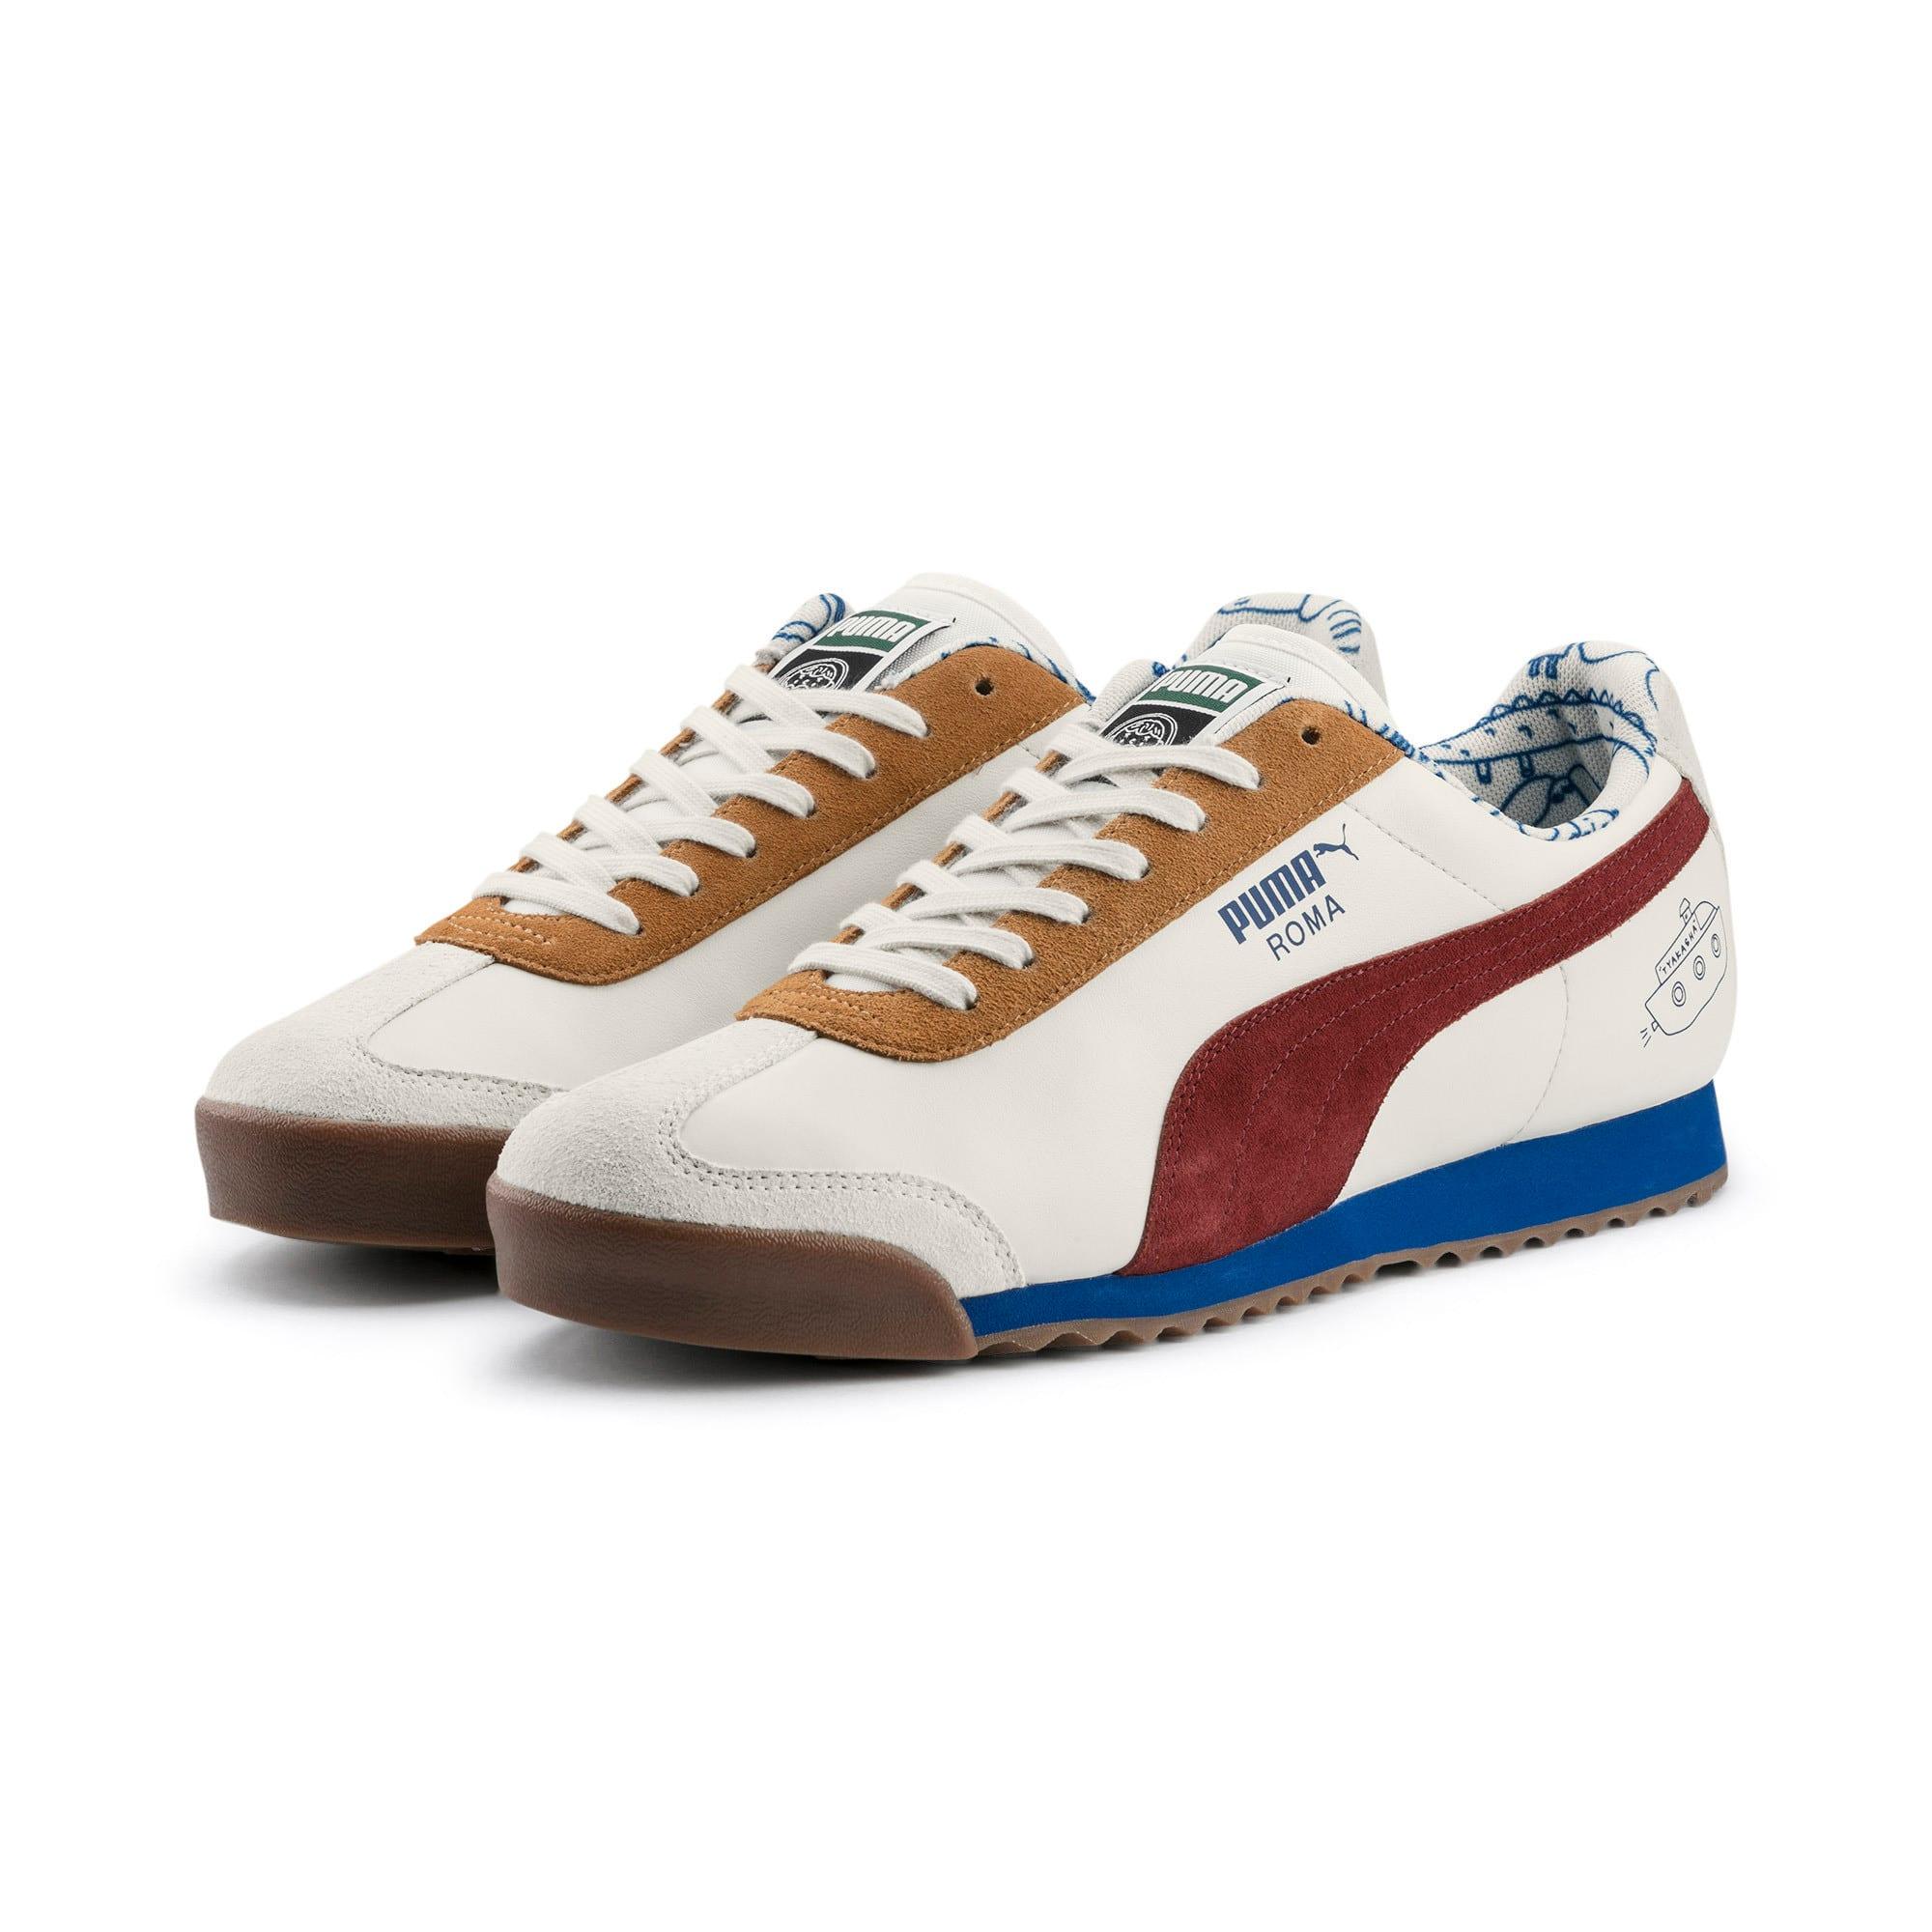 Thumbnail 4 of PUMA x TYAKASHA Roma Sneakers, Marshmallow-Fired Brick, medium